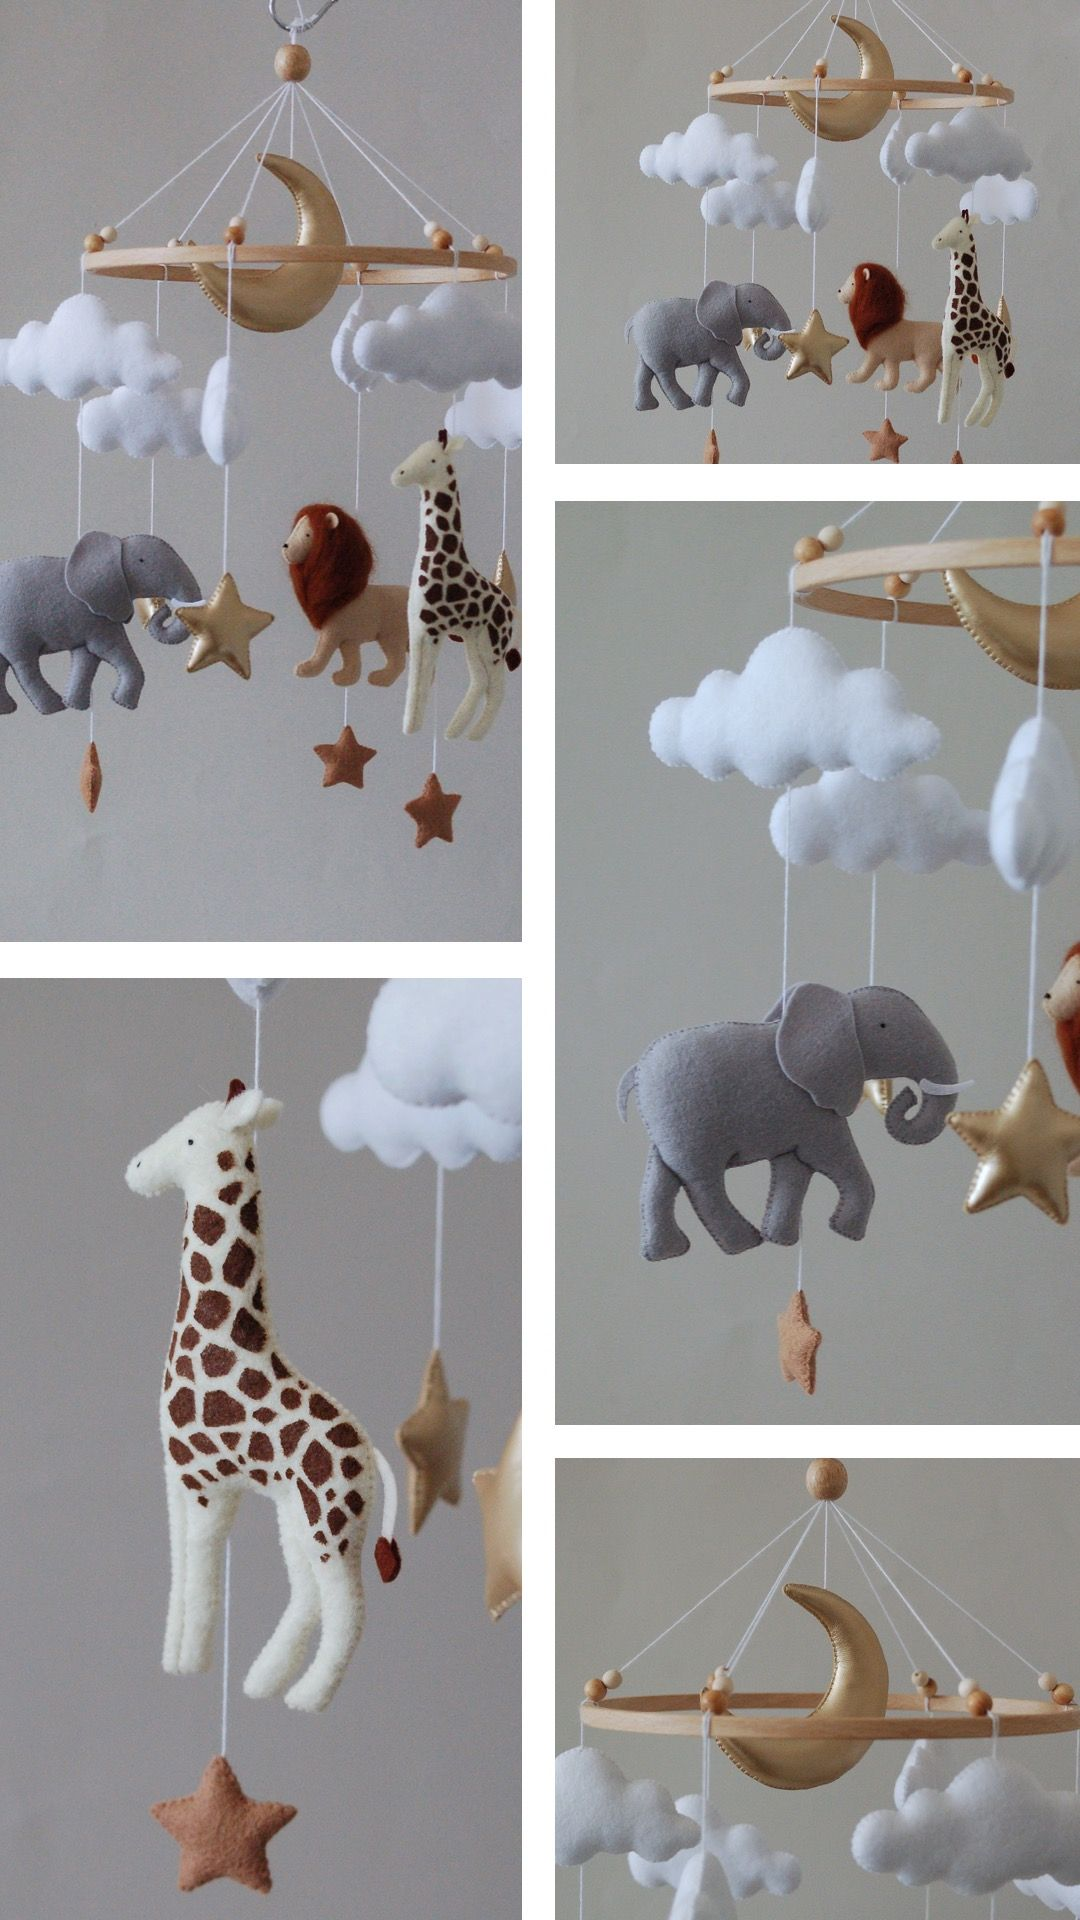 ", baby mobile ""safari gold"", My Babies Blog 2020, My Babies Blog 2020"